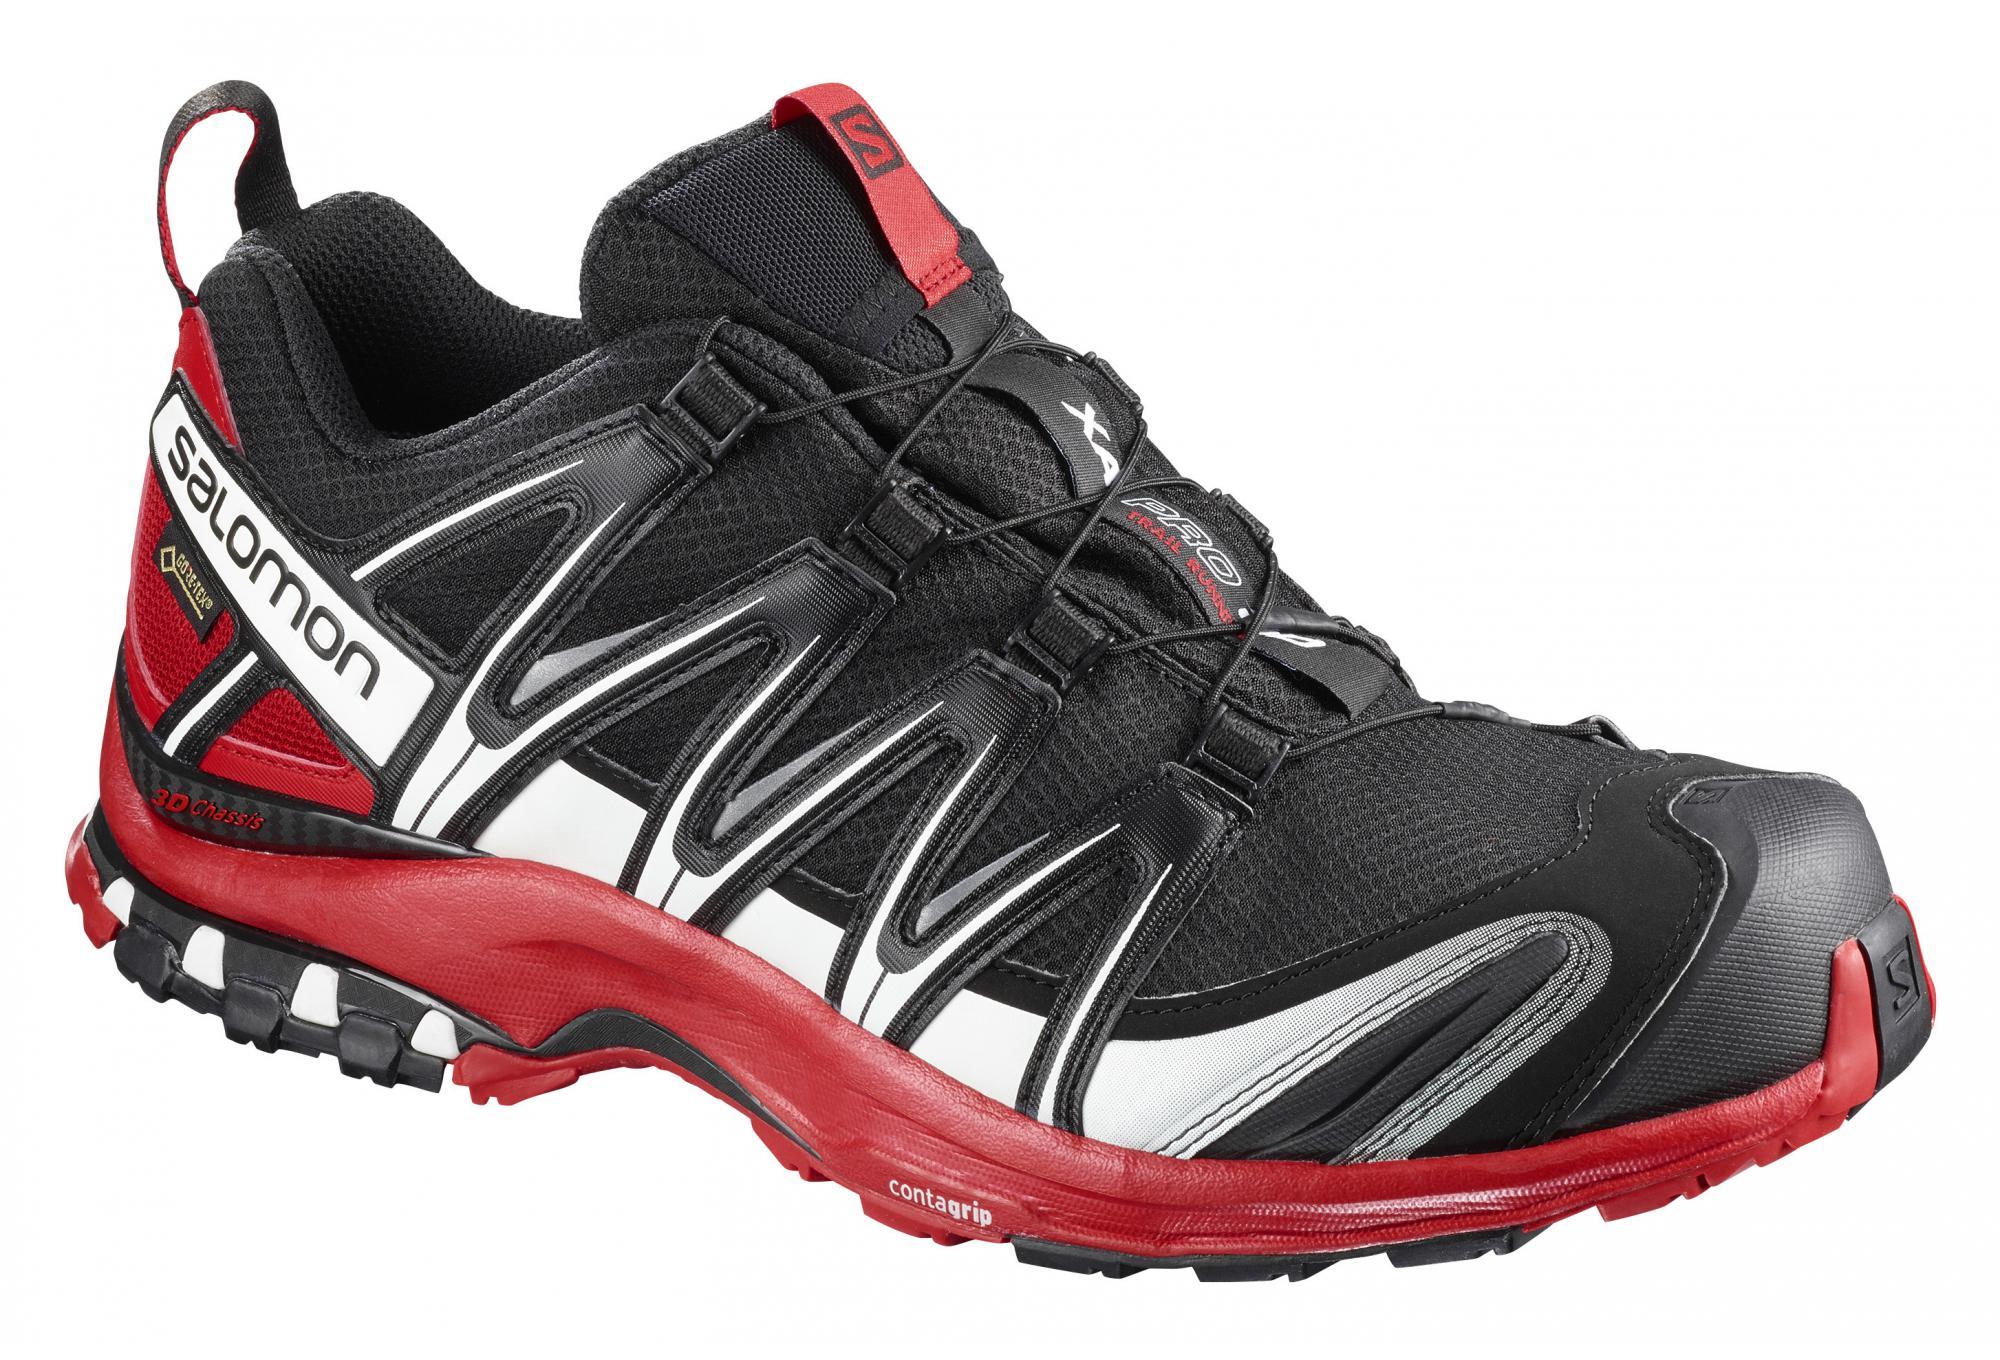 newest 8bf22 a9493 Salomon S-Lab XA 3D GTX Shoes Black Red   Alltricks.com